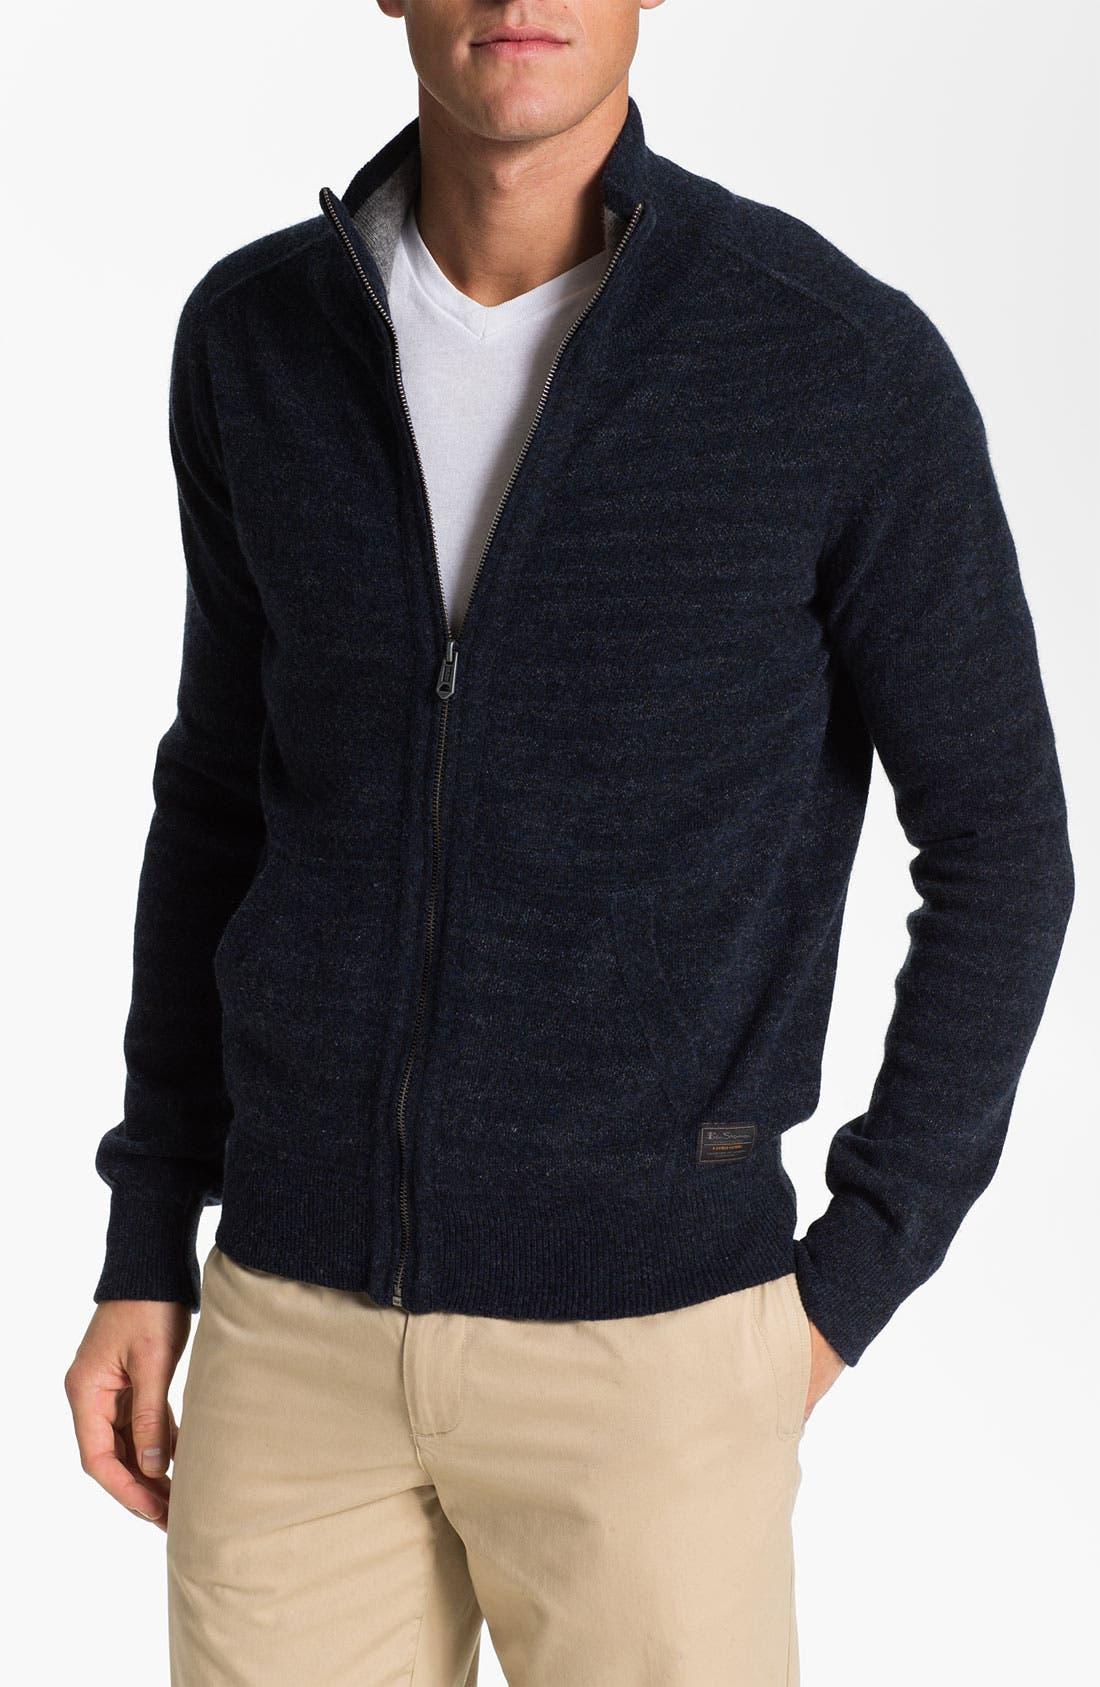 Alternate Image 1 Selected - Ben Sherman Zip Sweater